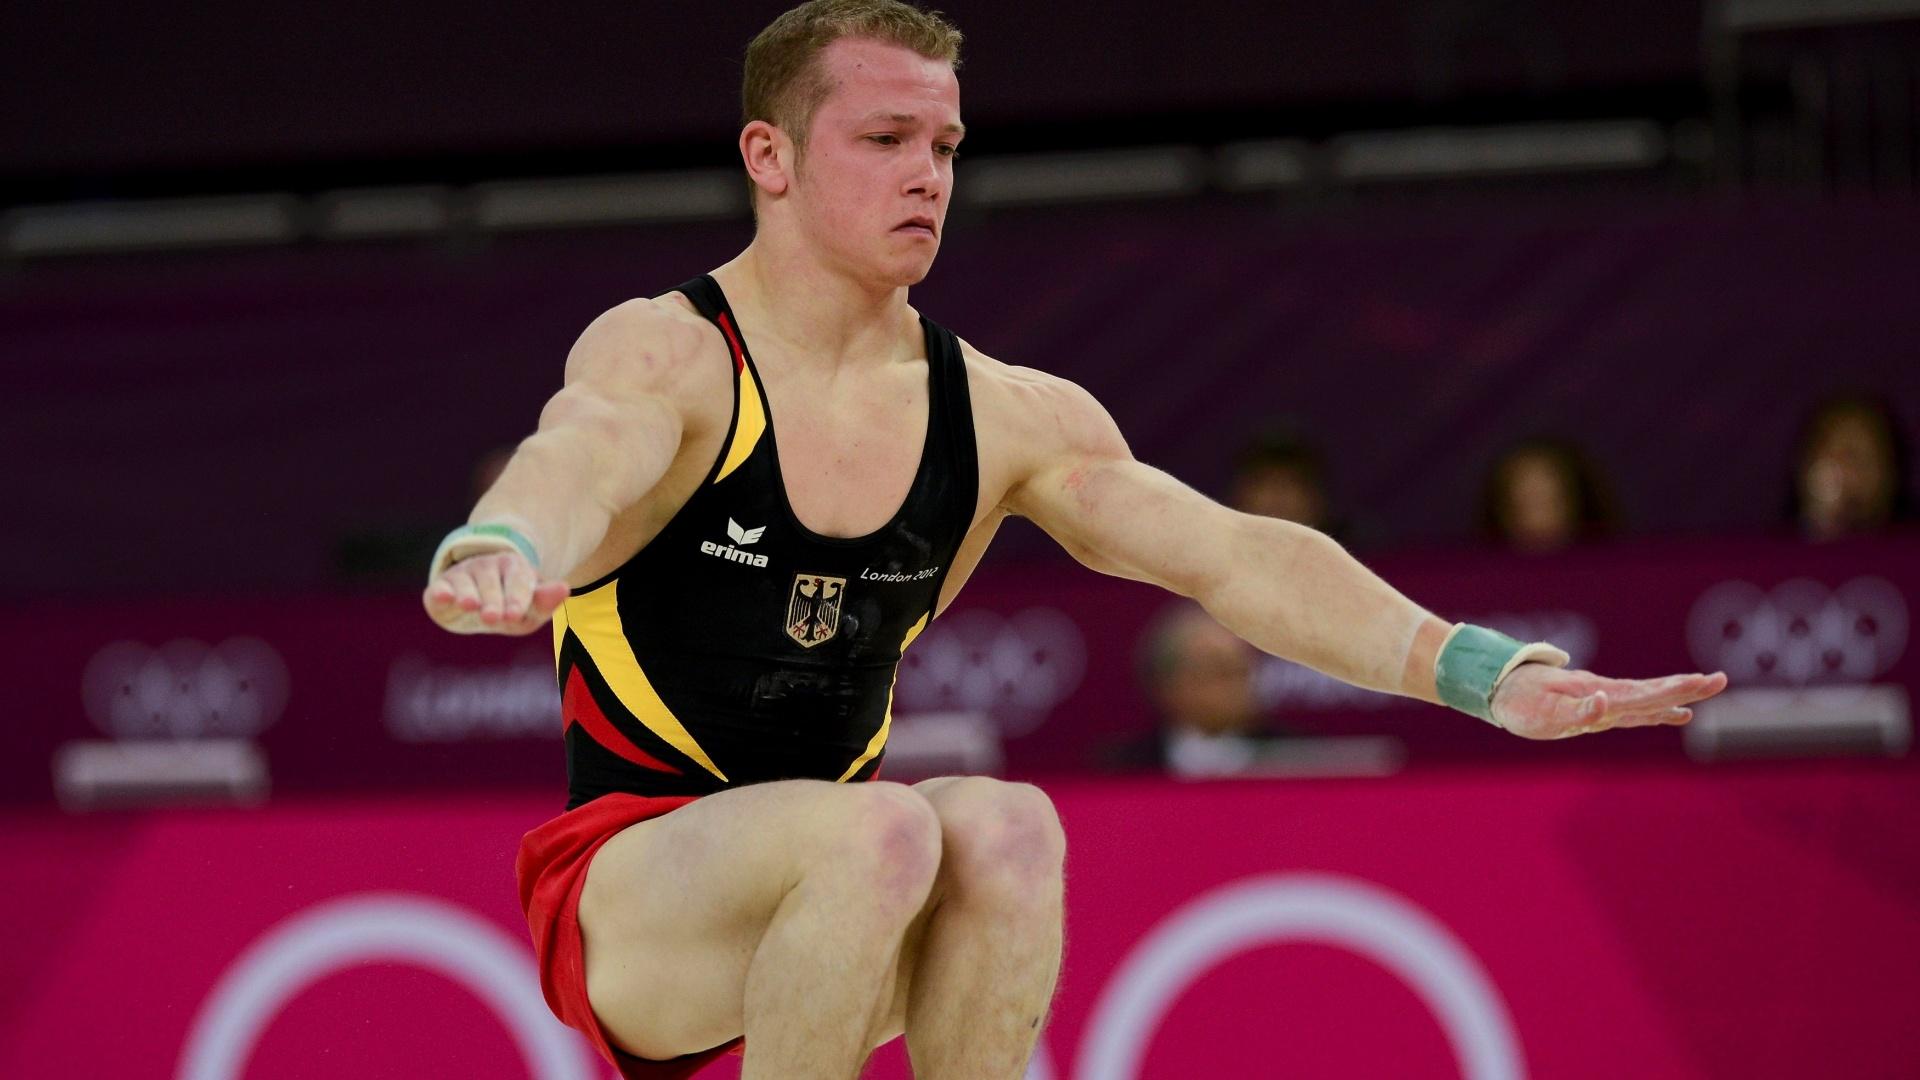 Alemão Fabian Hambuchen se apresenta no solo na final individual geral da ginástica artística em Londres